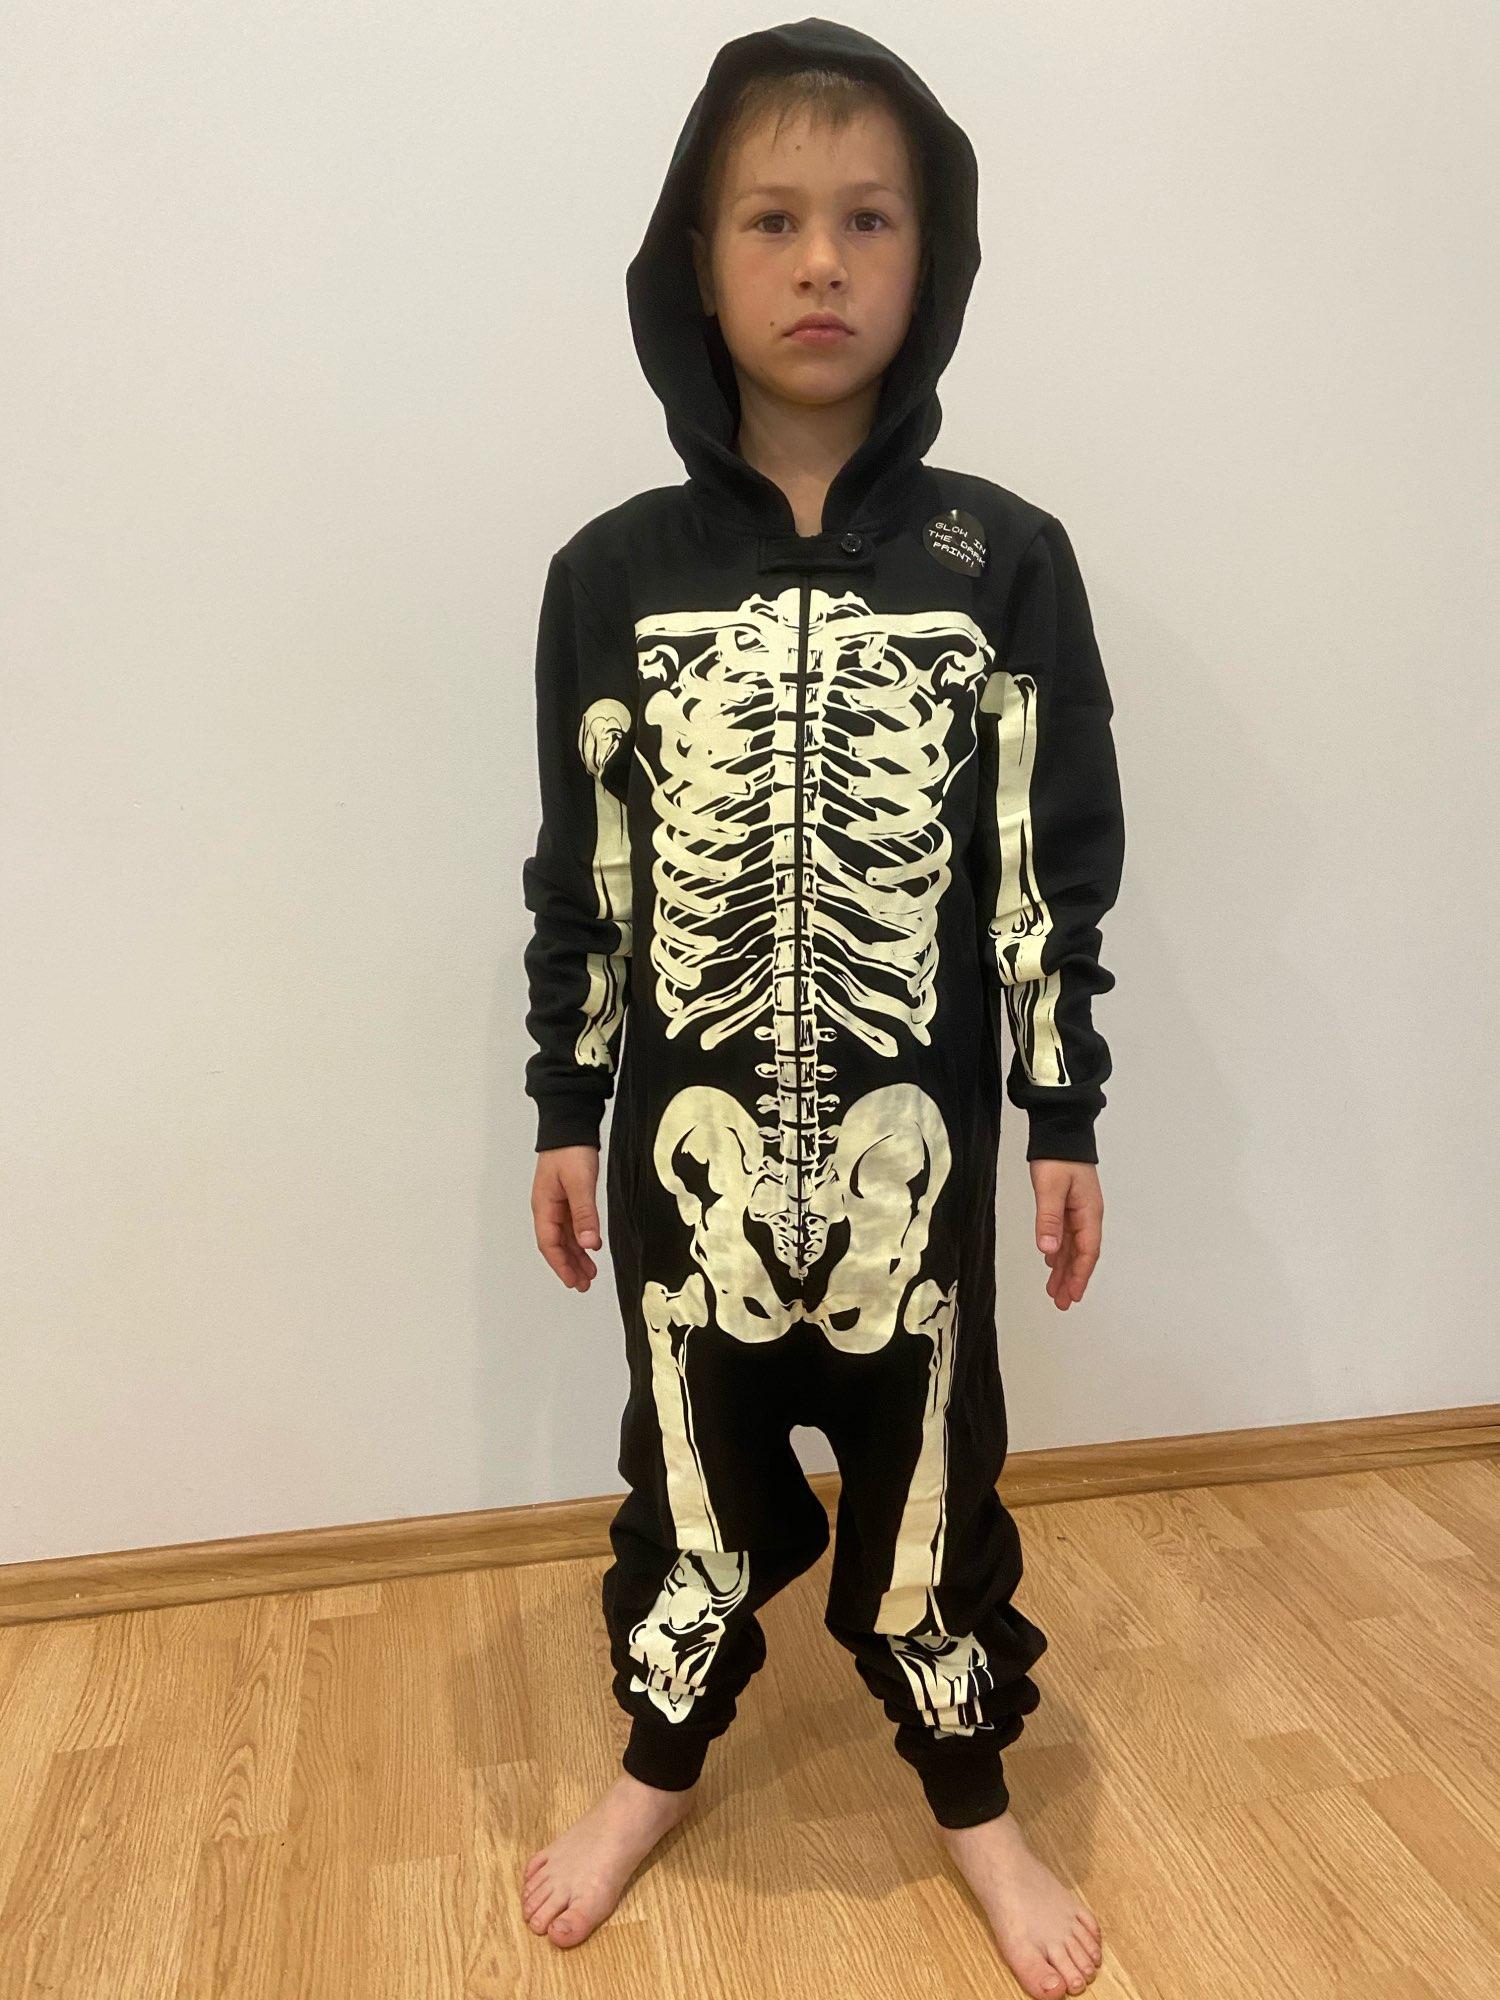 Autumn Winter Skeleton Overalls Jumpsuit Kids Pajamas Children Onesie Sleepers Pajamas Christmas Halloween Costumes photo review